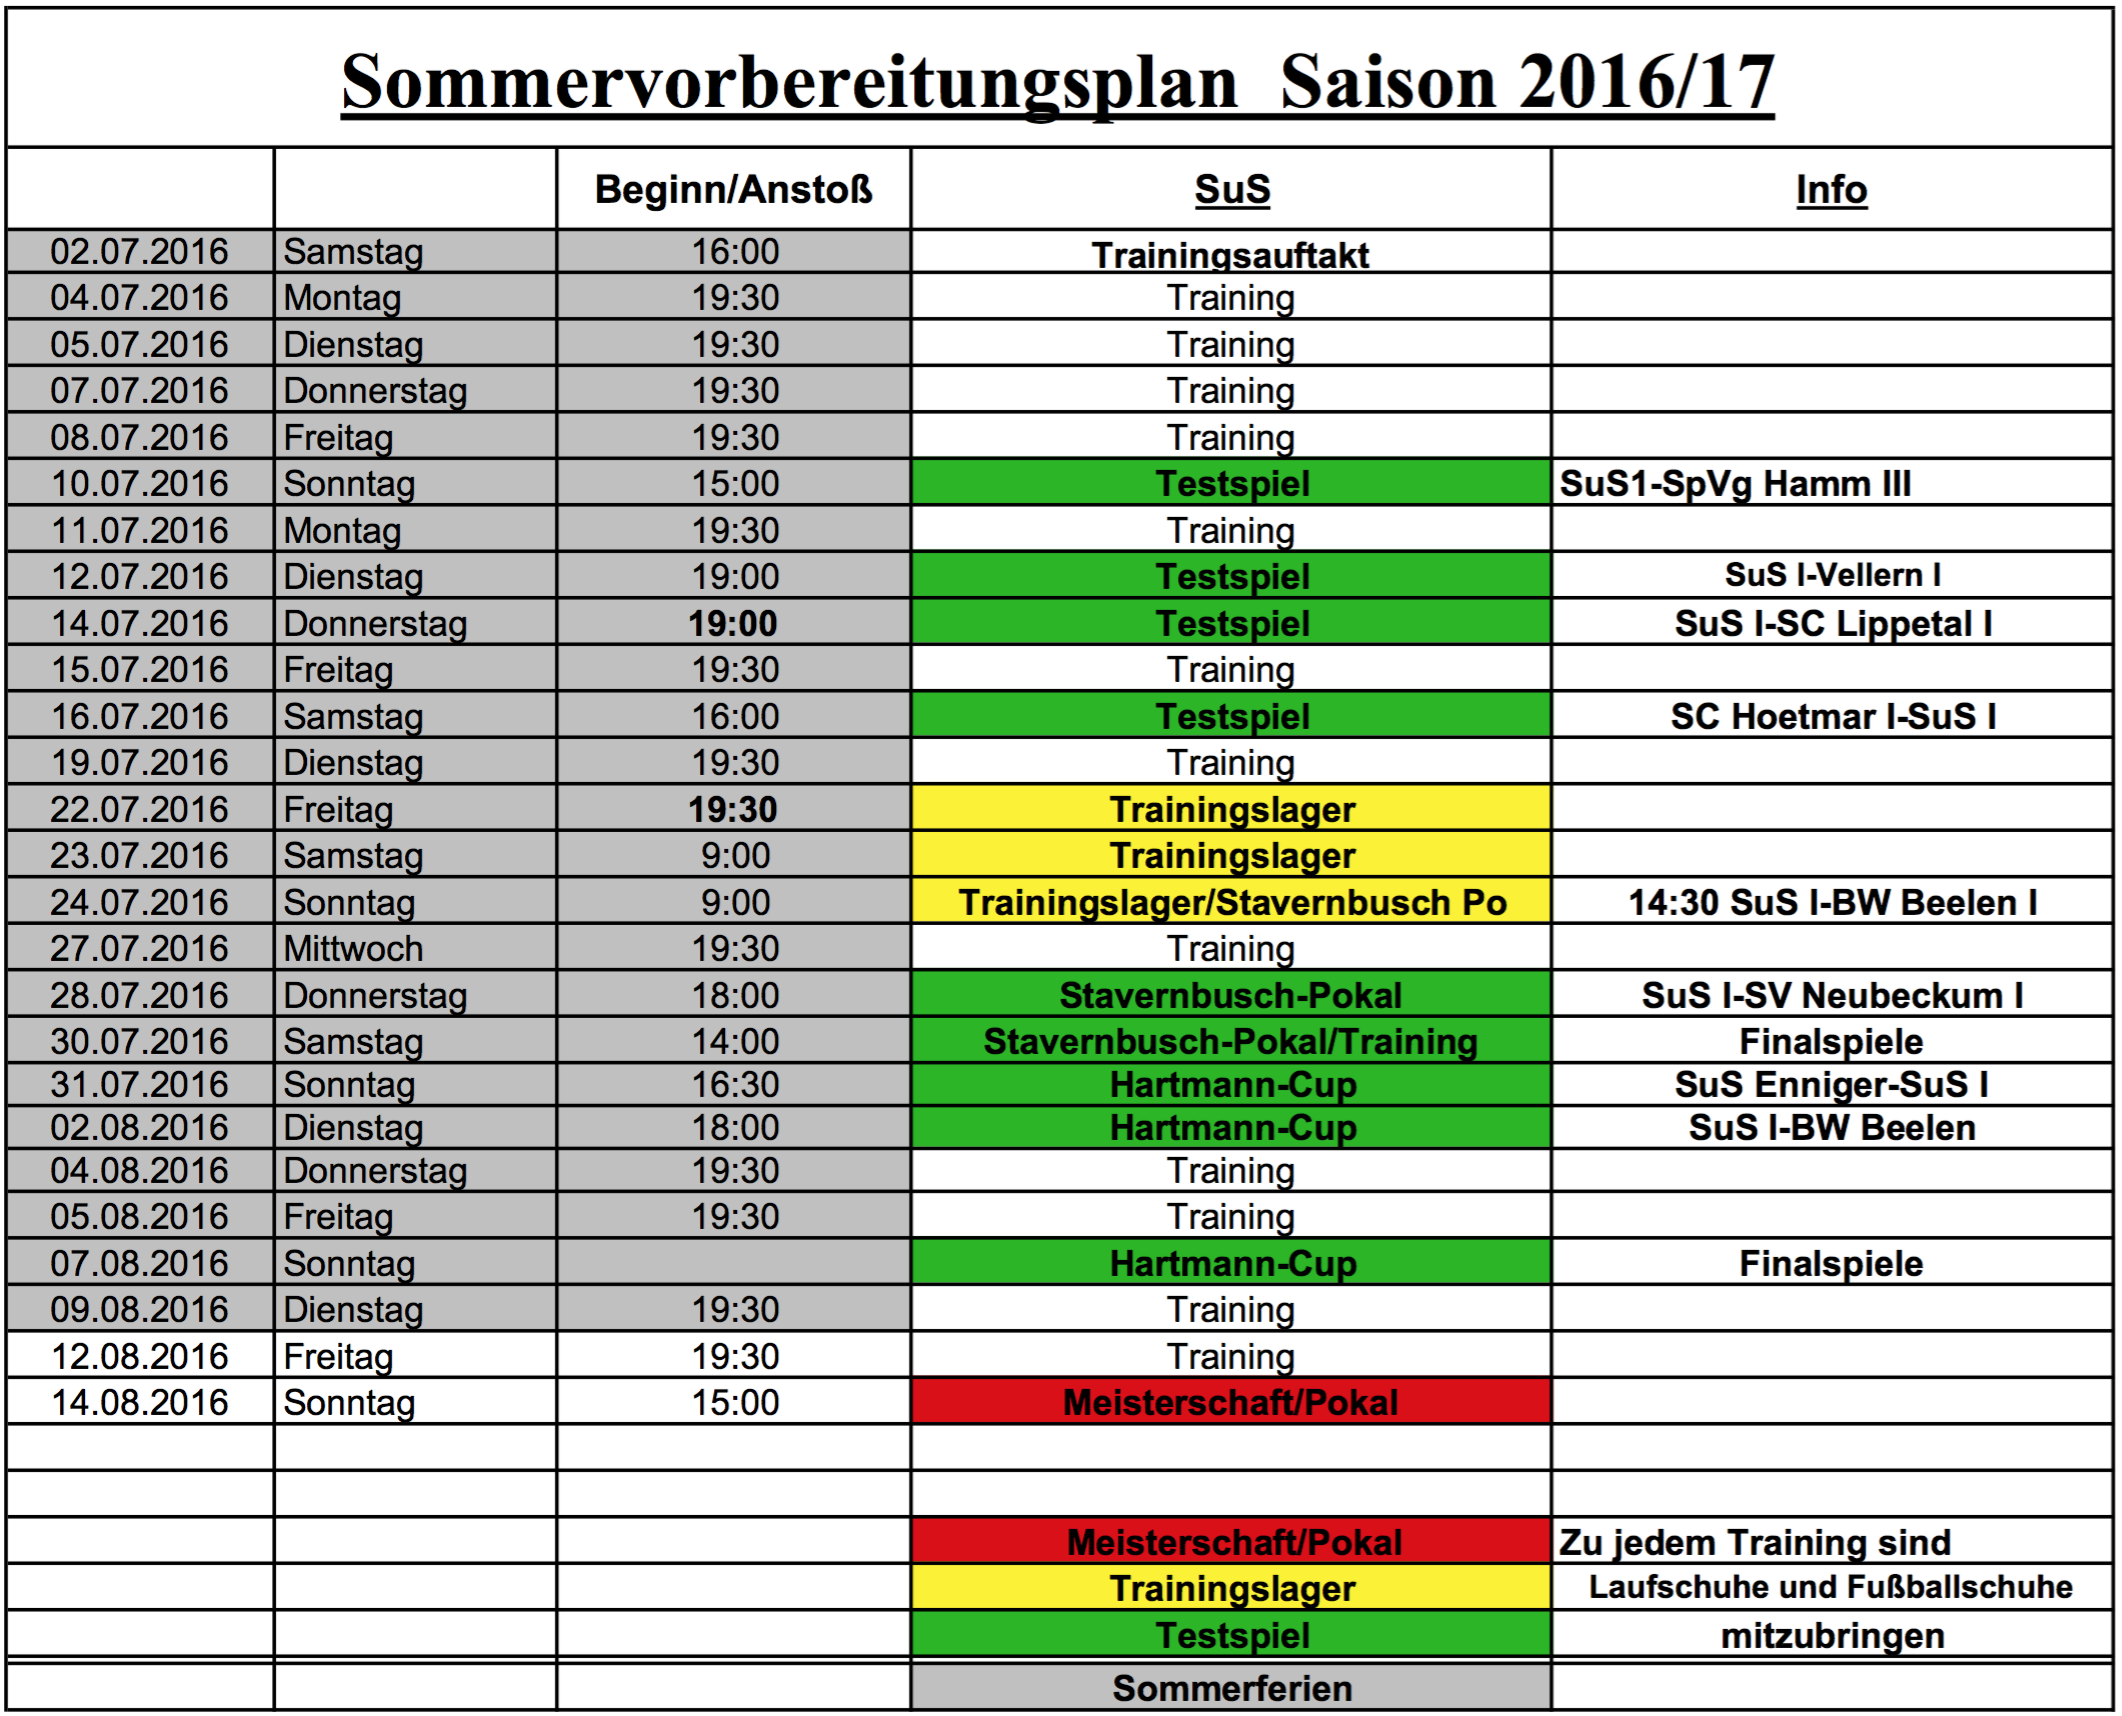 Sommervorbereitung Senioren 2016/17